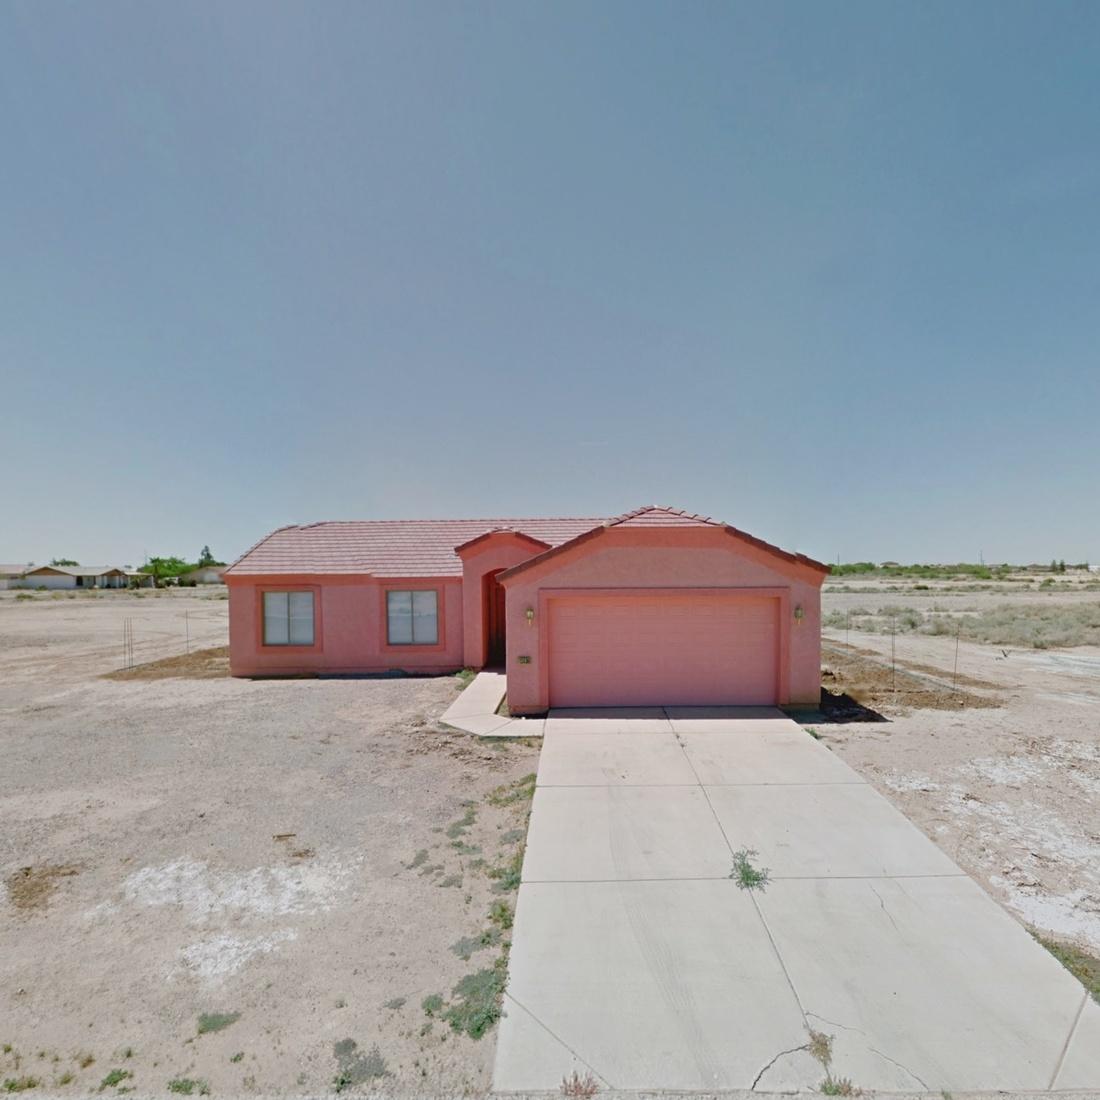 Arizona City, Arizona, United States. Photograph by Jacqui Kenny via Google Street View.